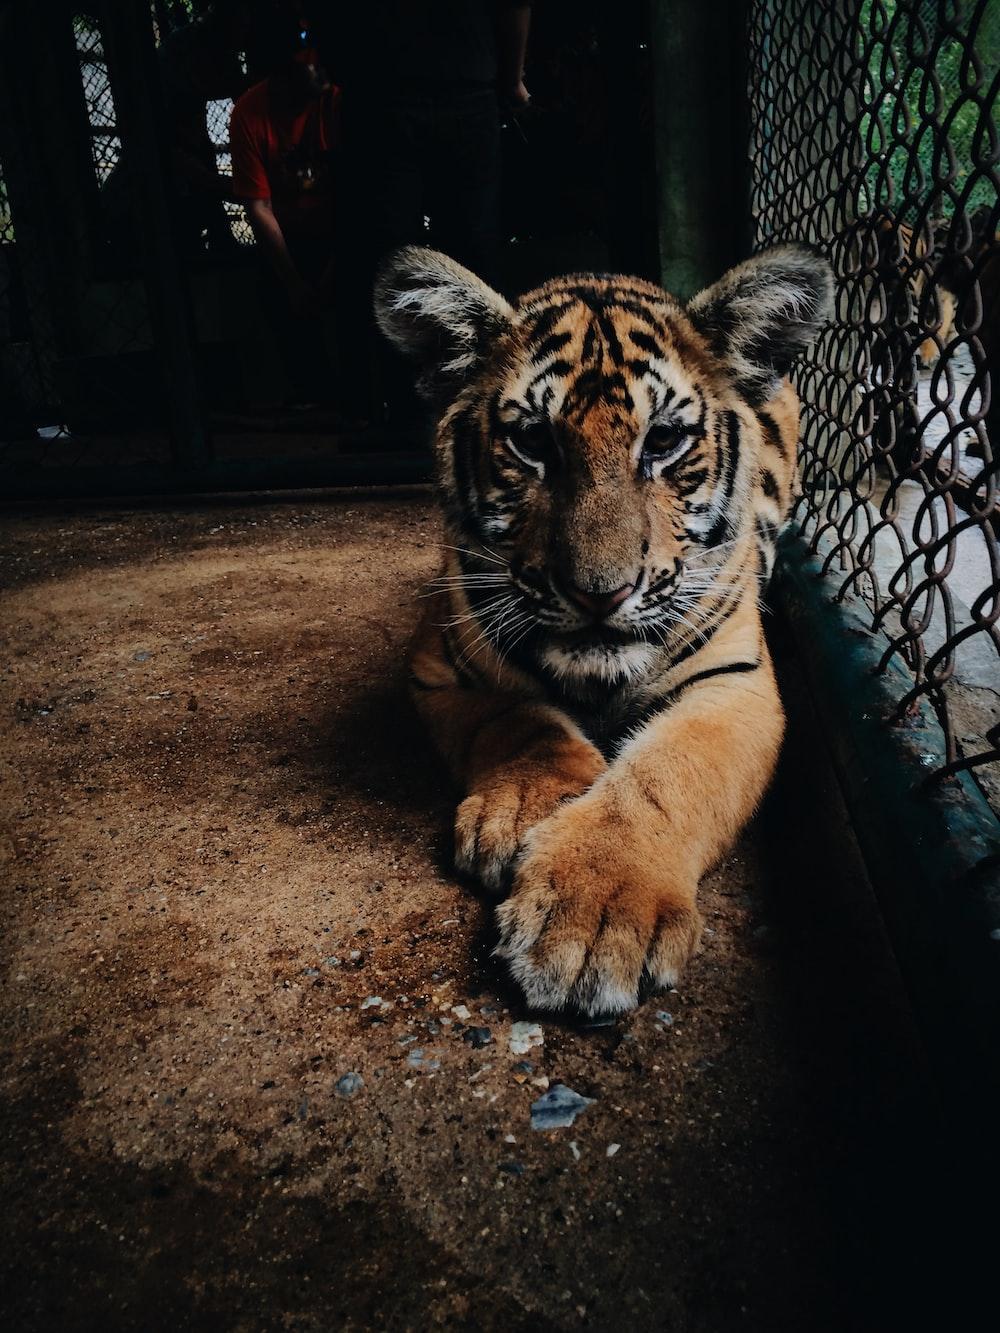 Sad-tiger-chain | HD photo by Chaz McGregor (@chazmcgregor